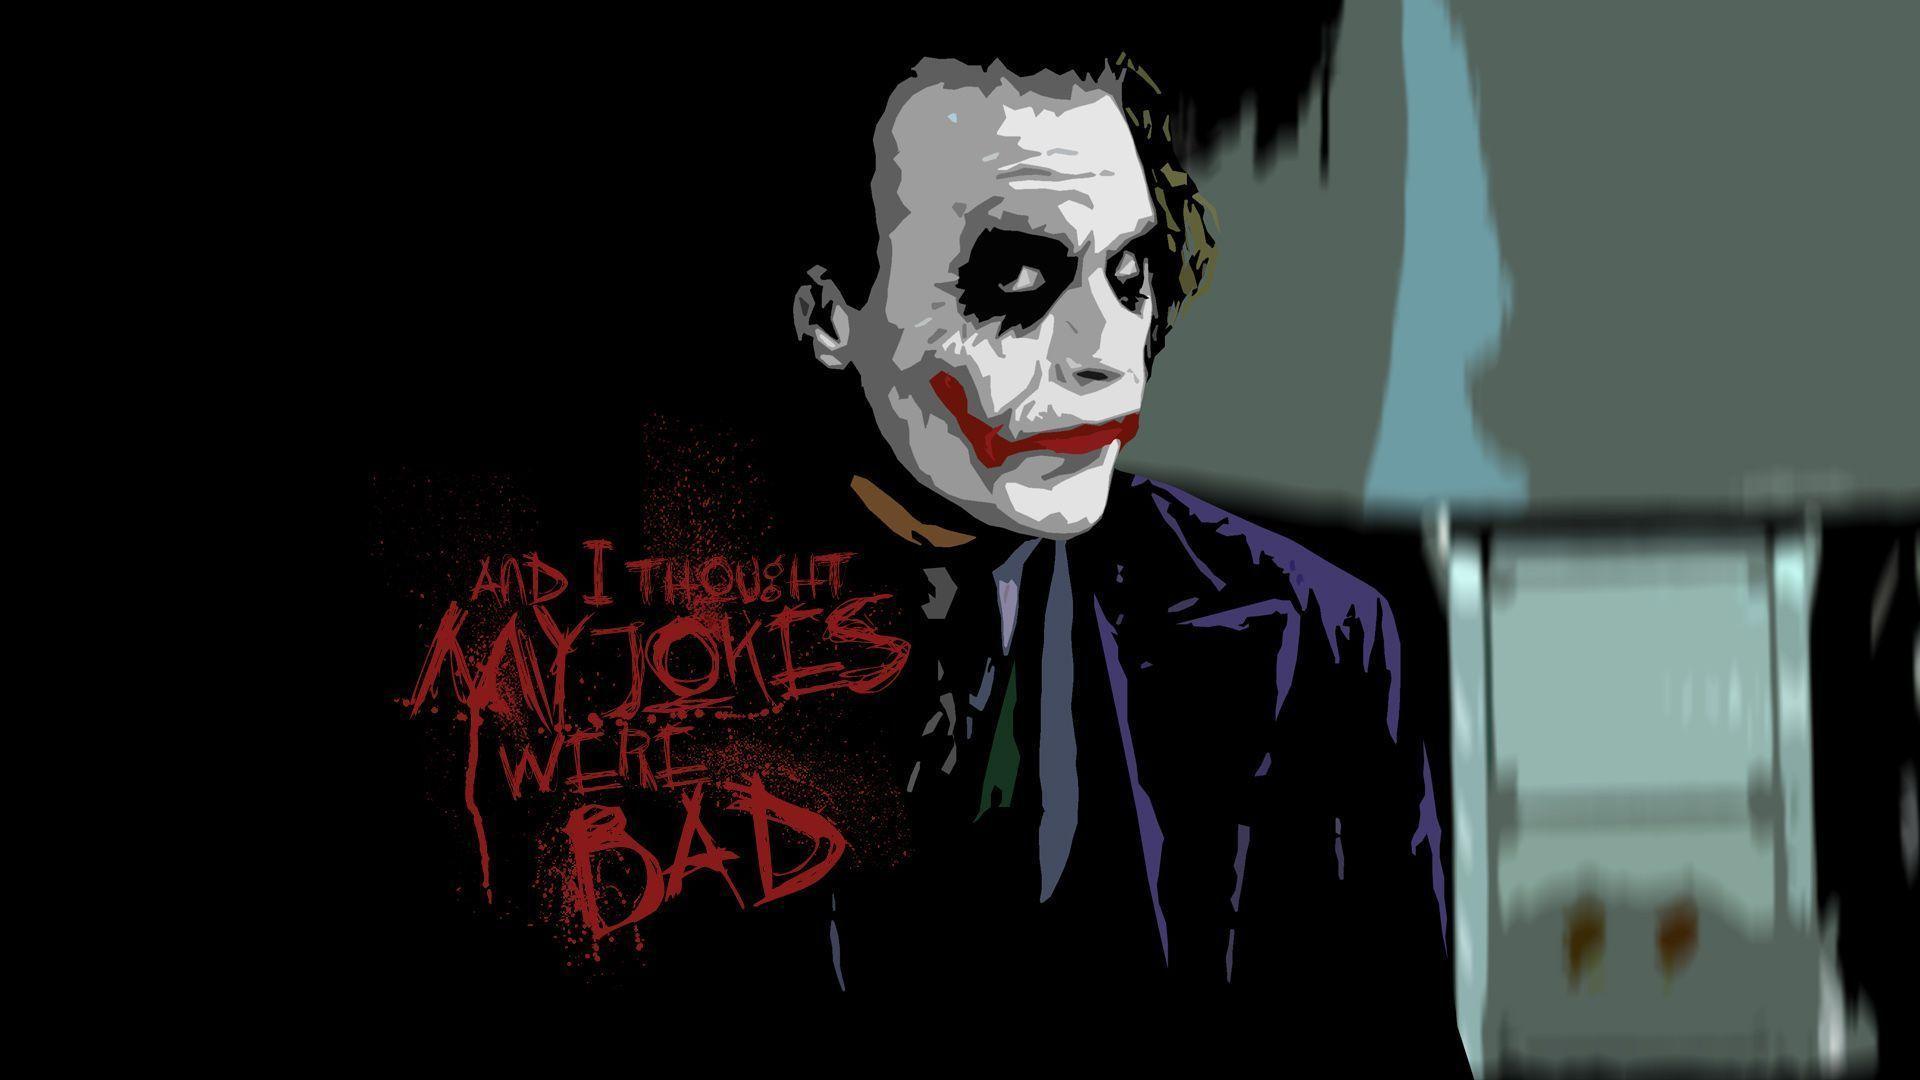 Sad Joker Wallpapers - Wallpaper Cave